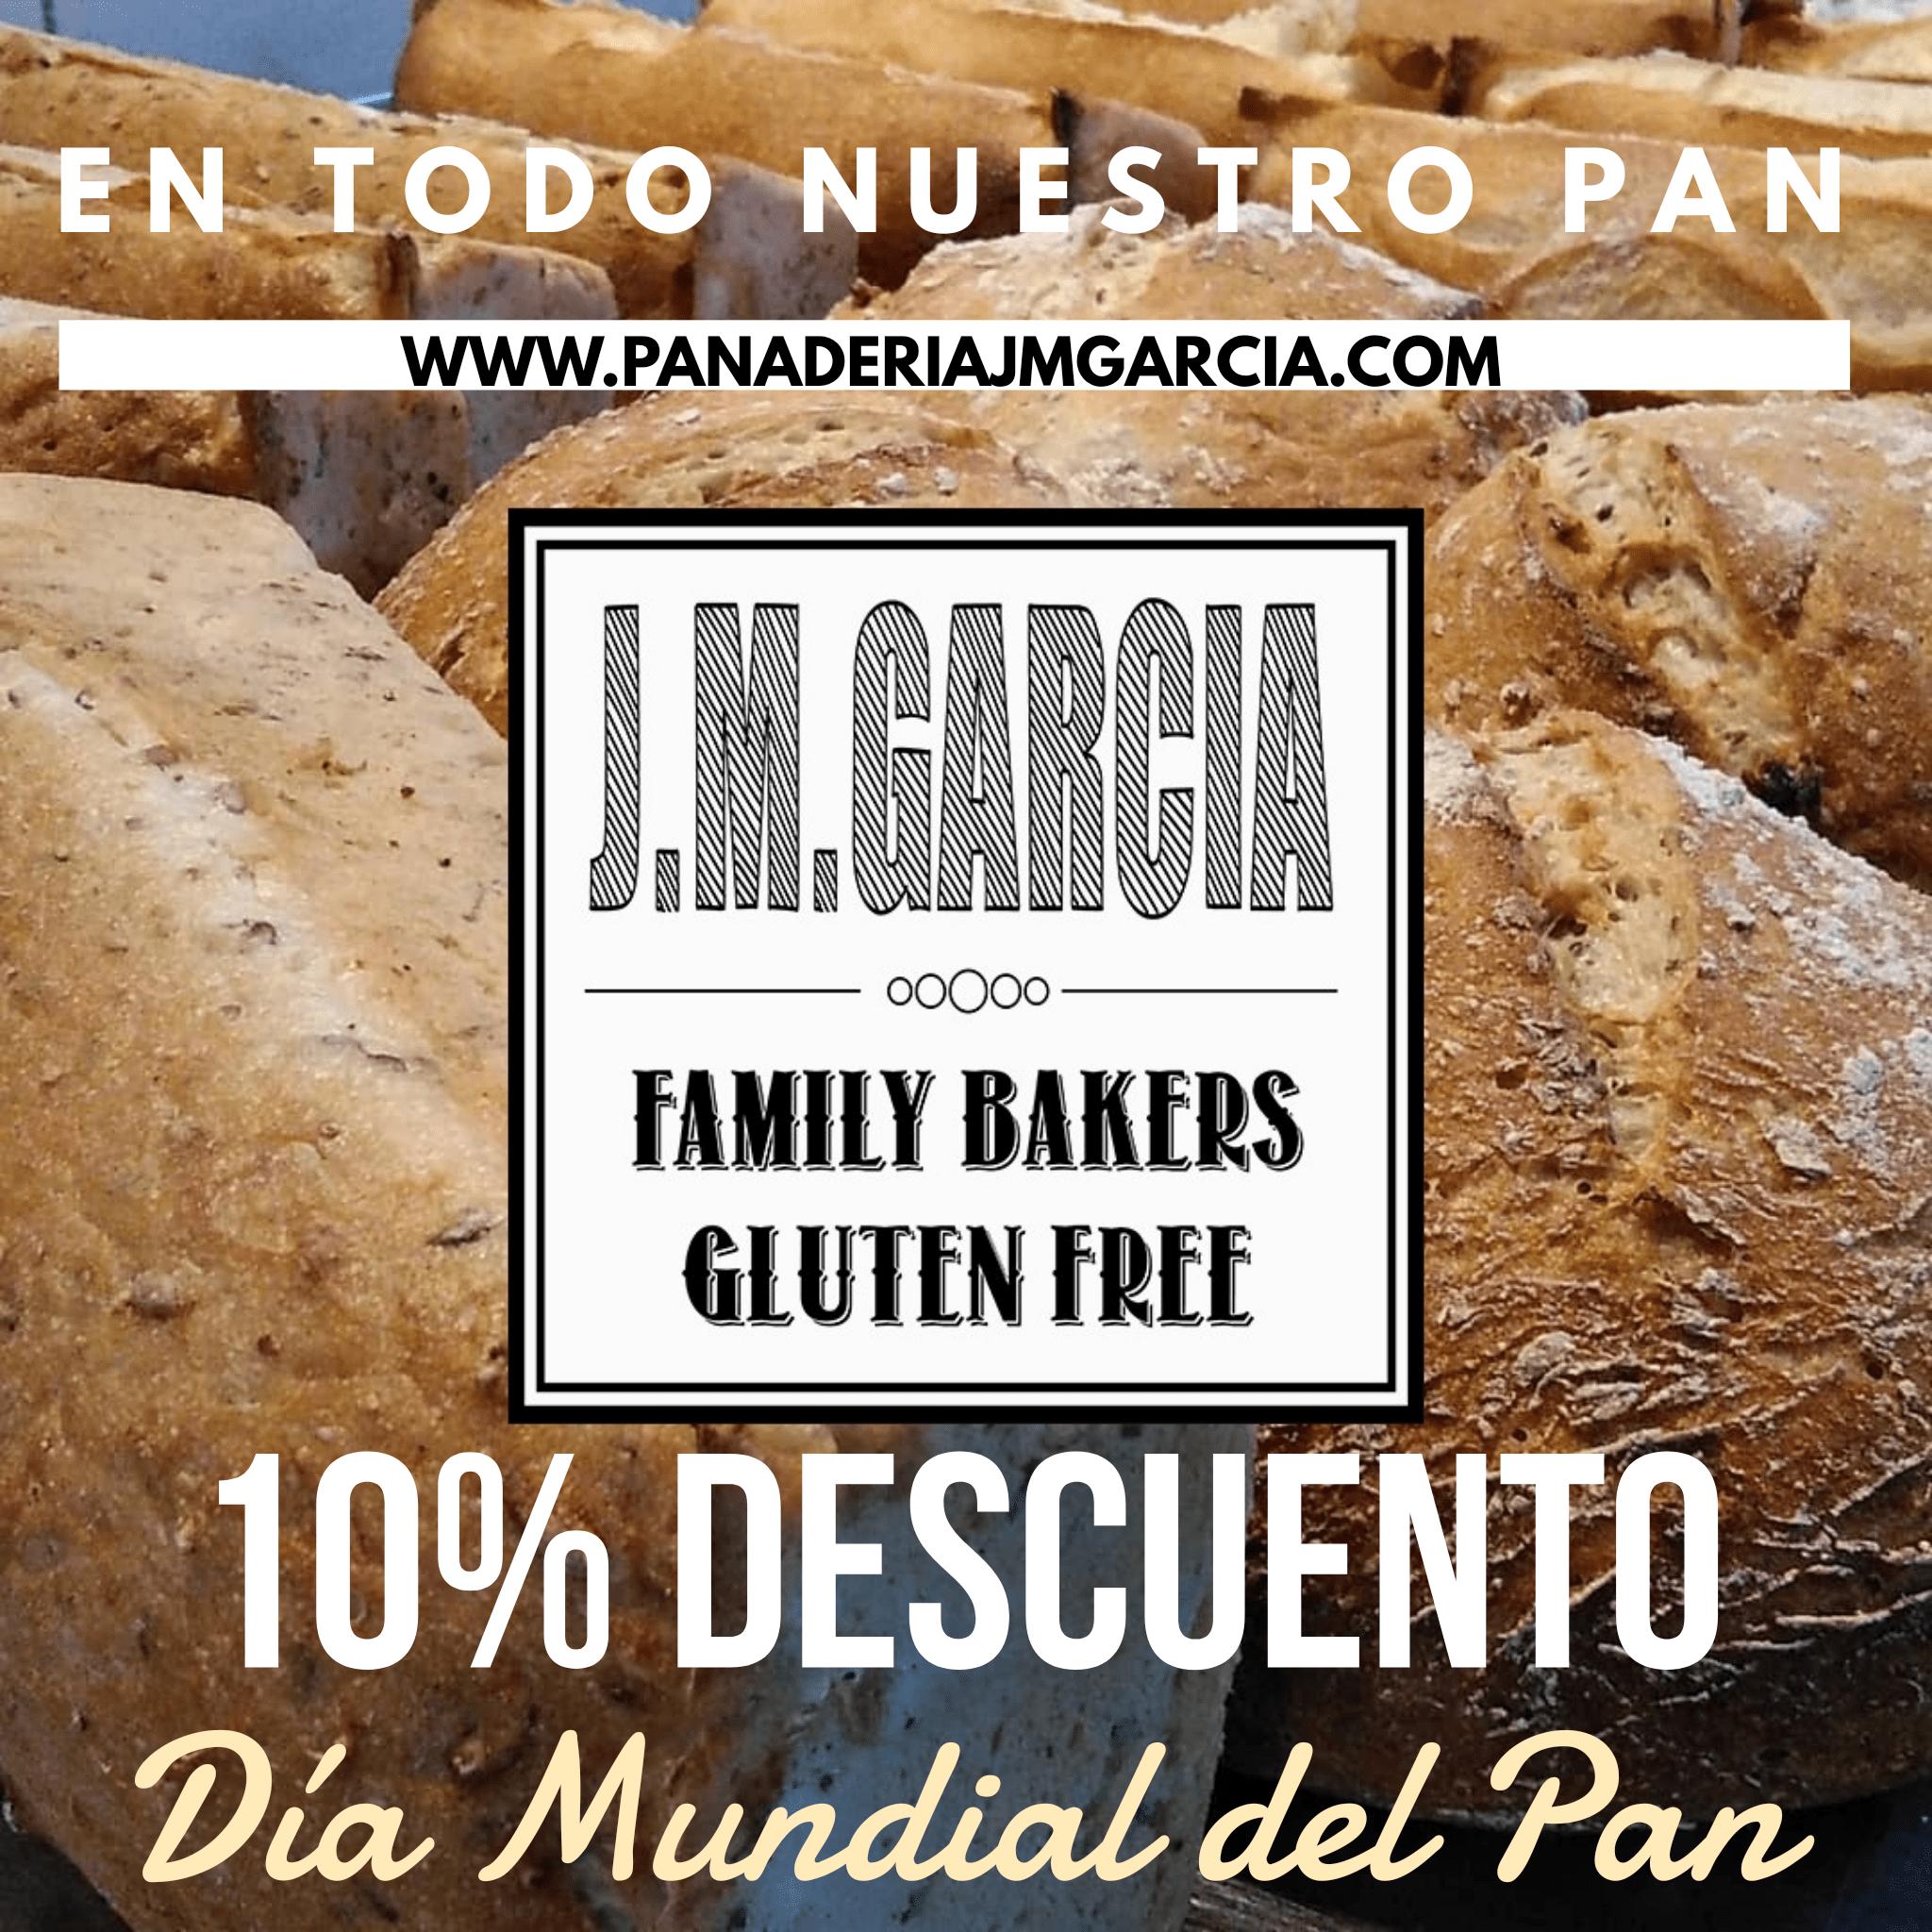 Diamundialdelpan_sin_gluten-panaderiajmgarcia